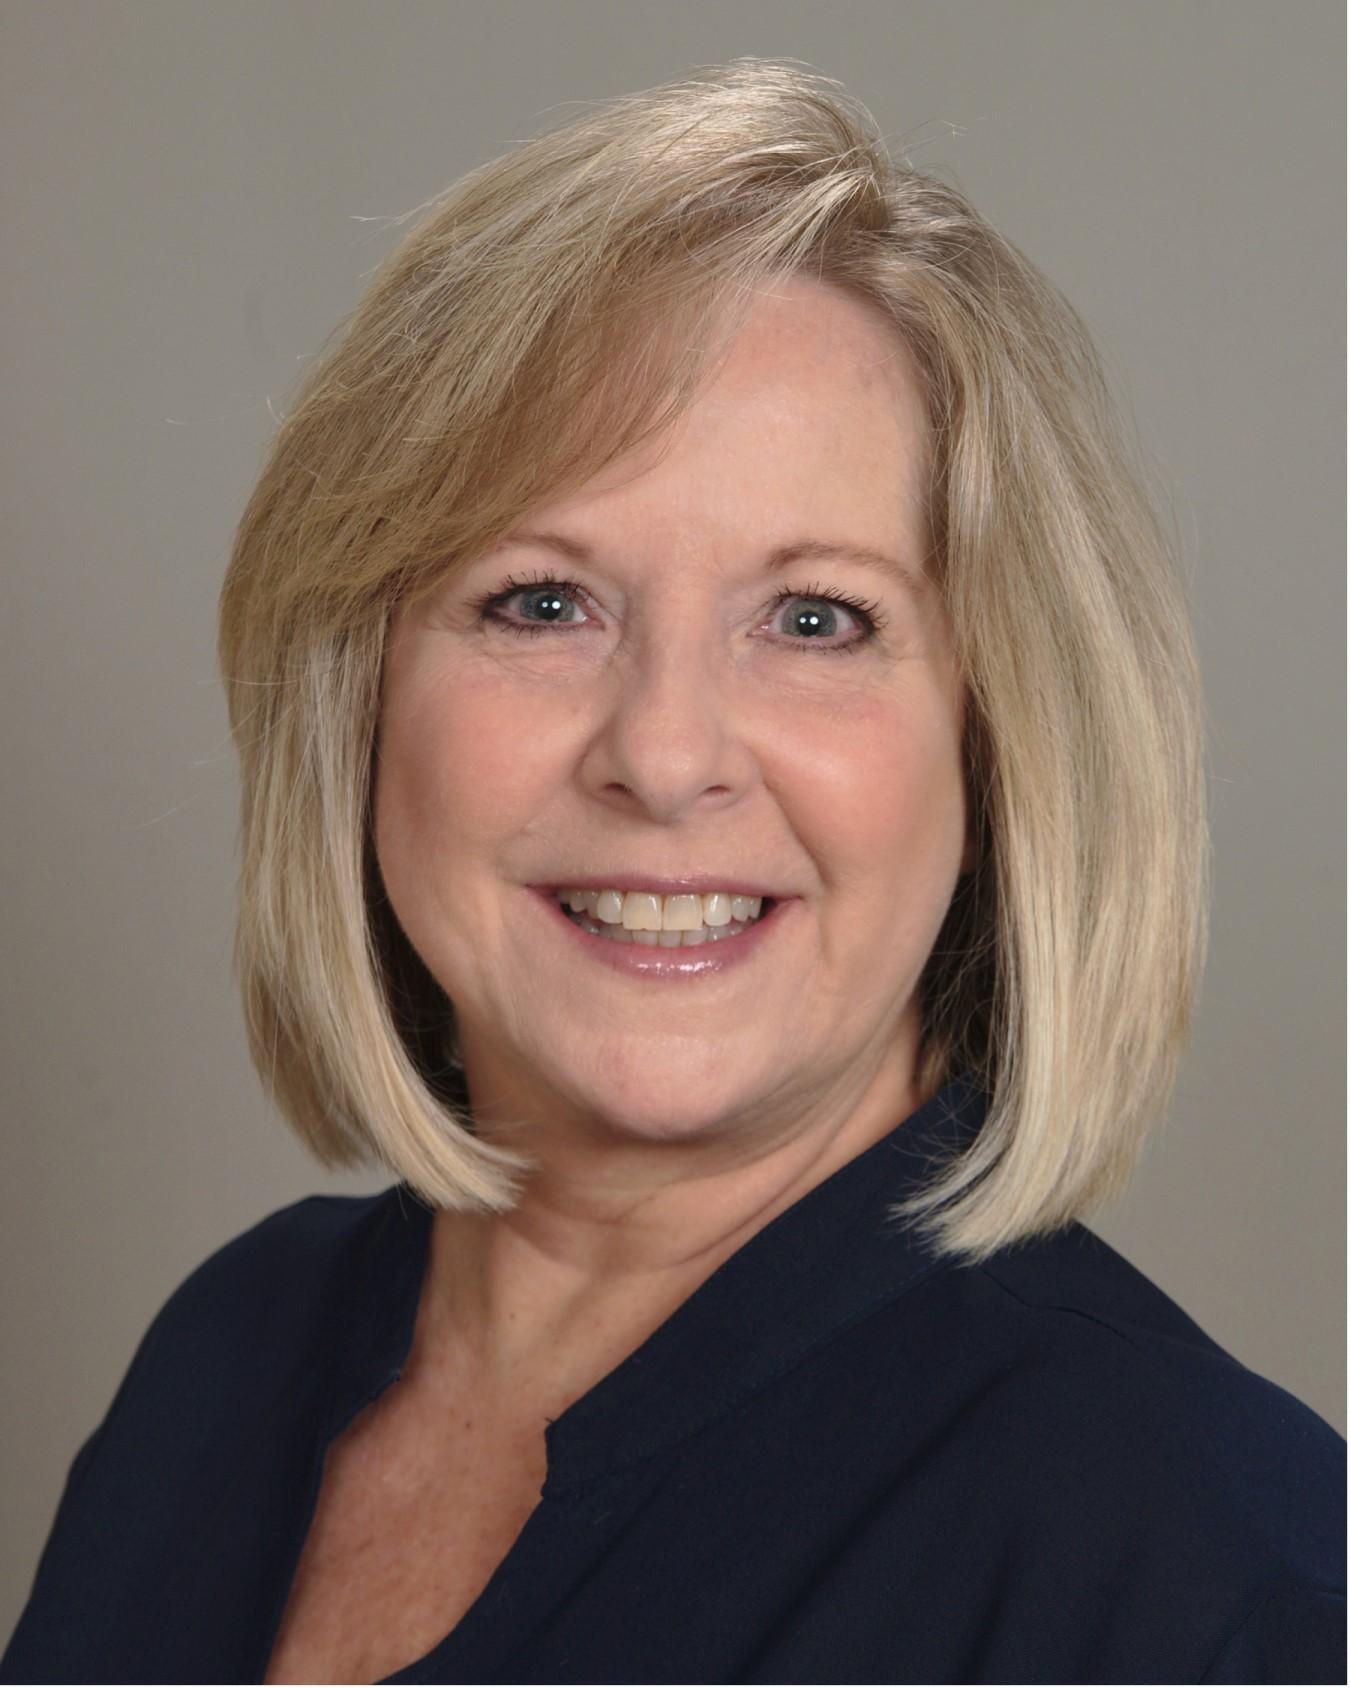 Sandy Allison